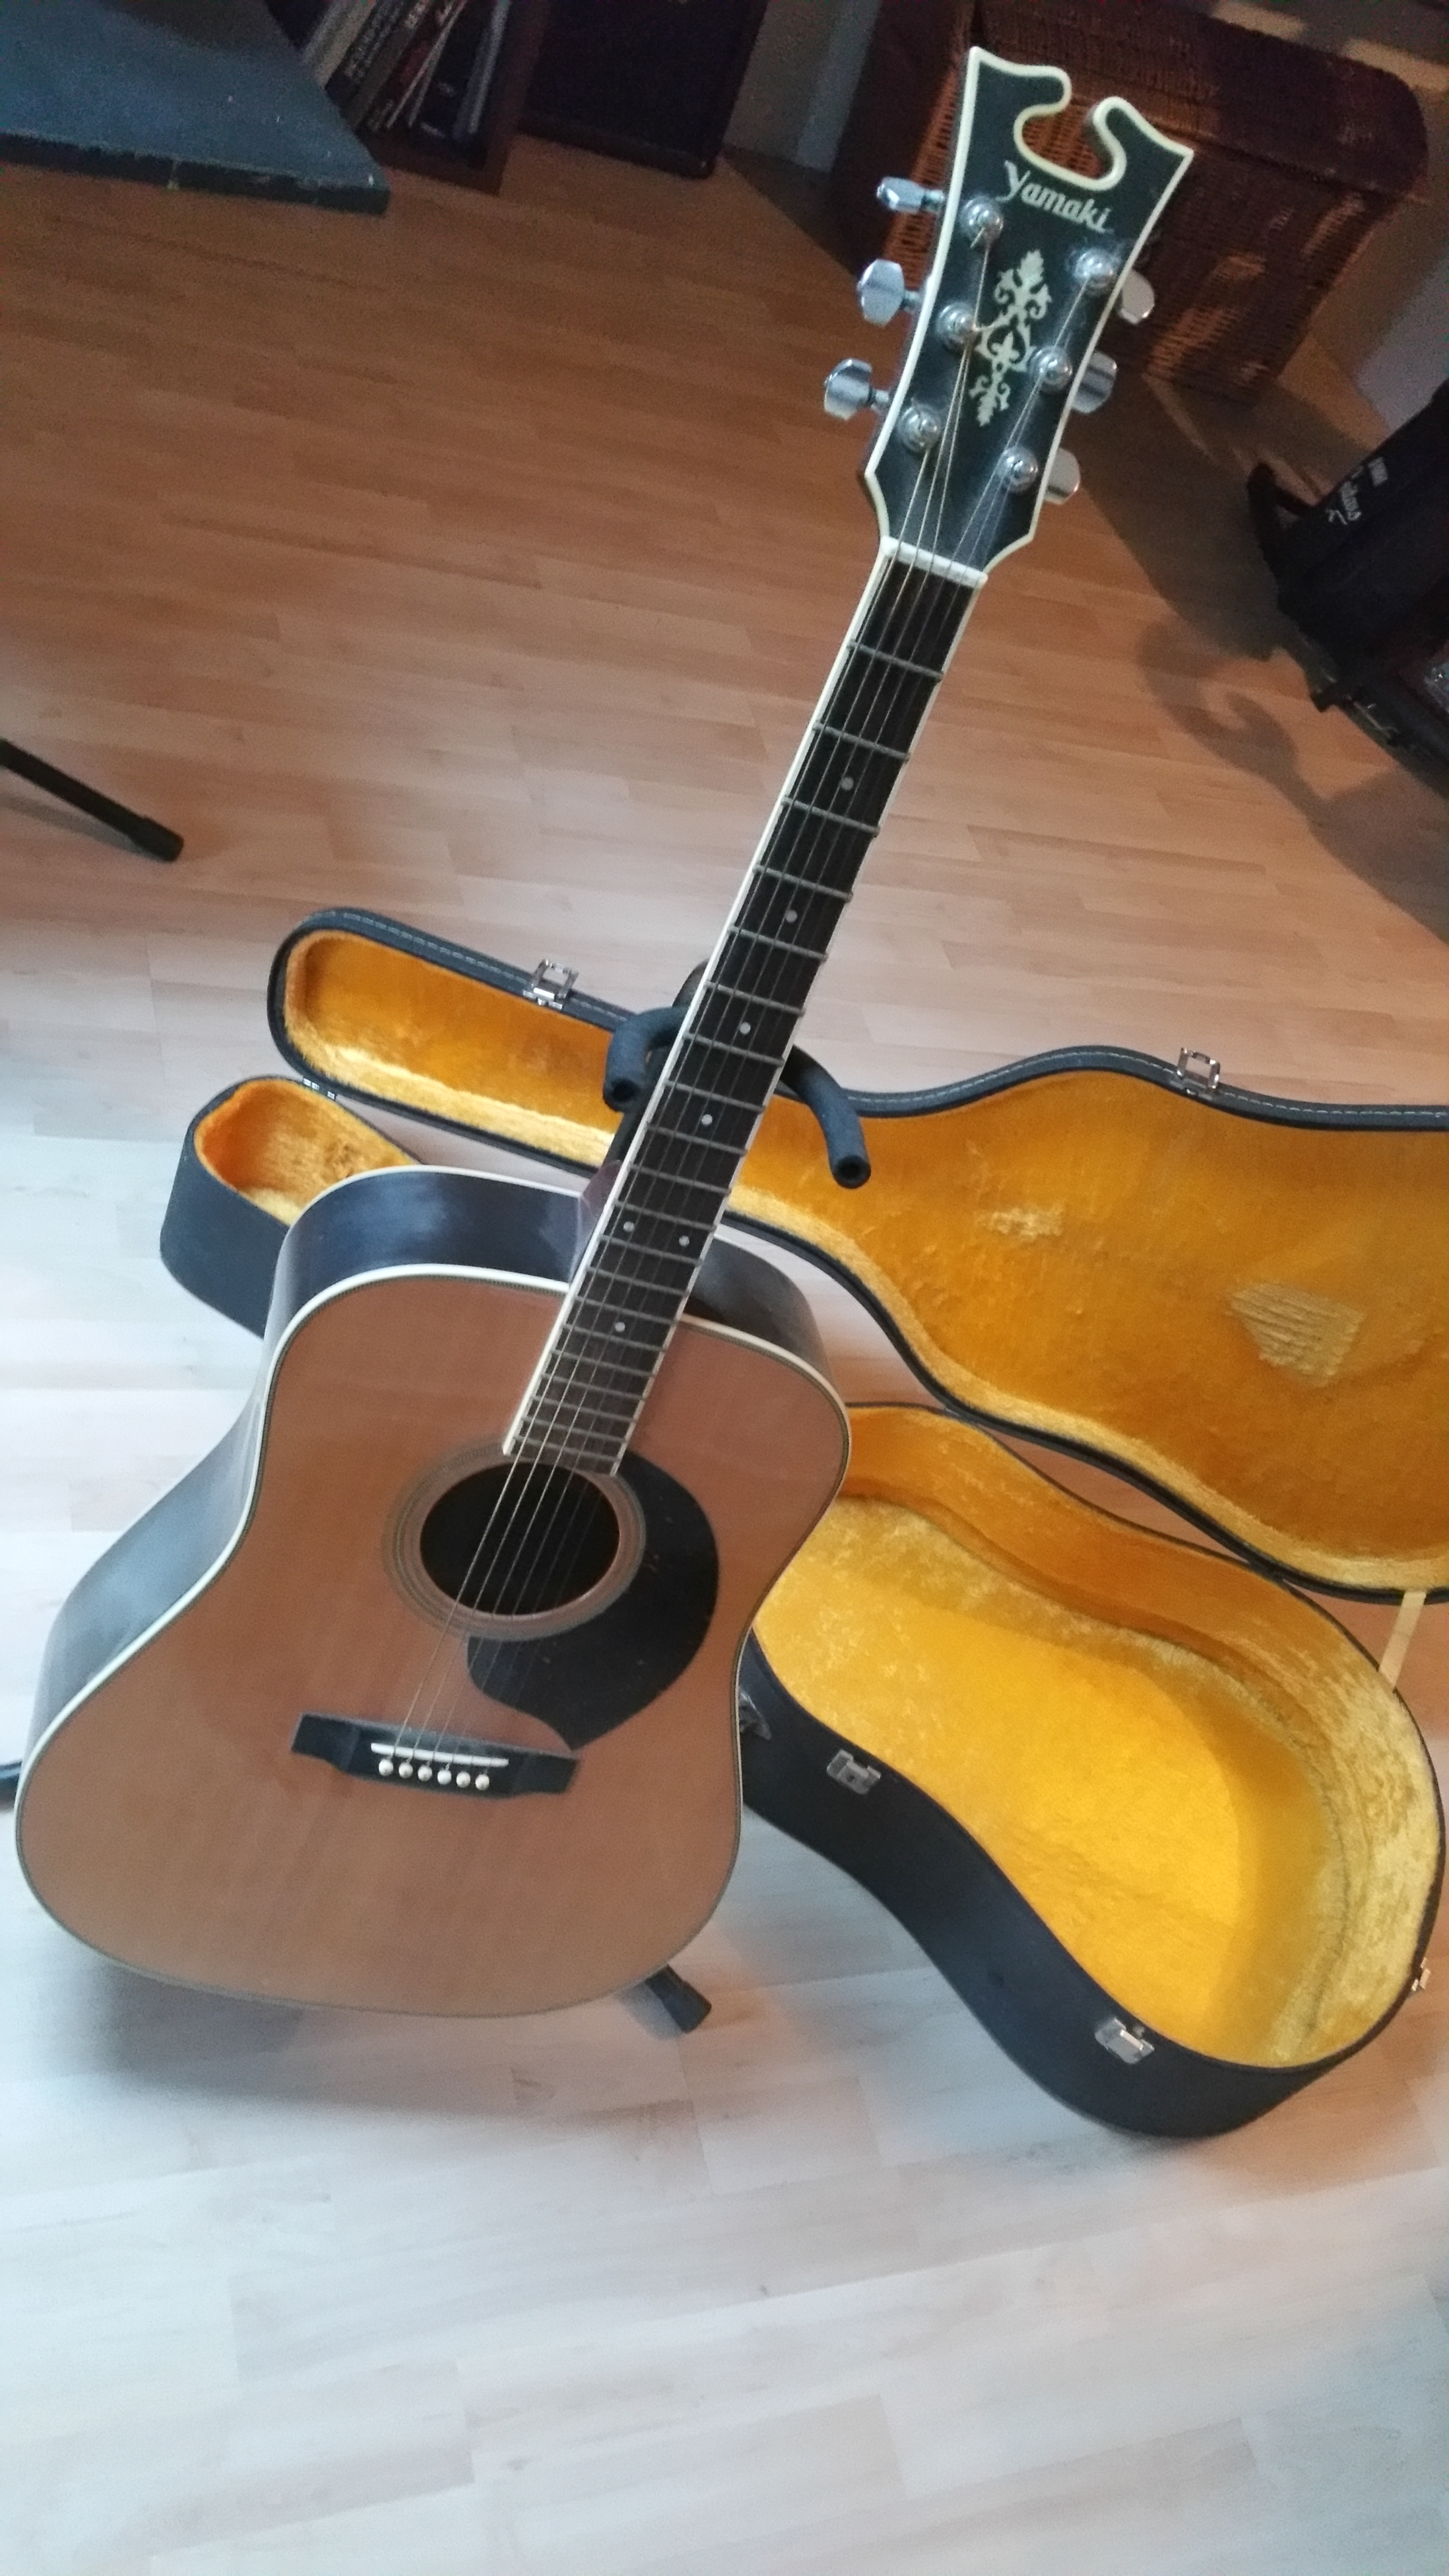 guitare acoustique yamaki